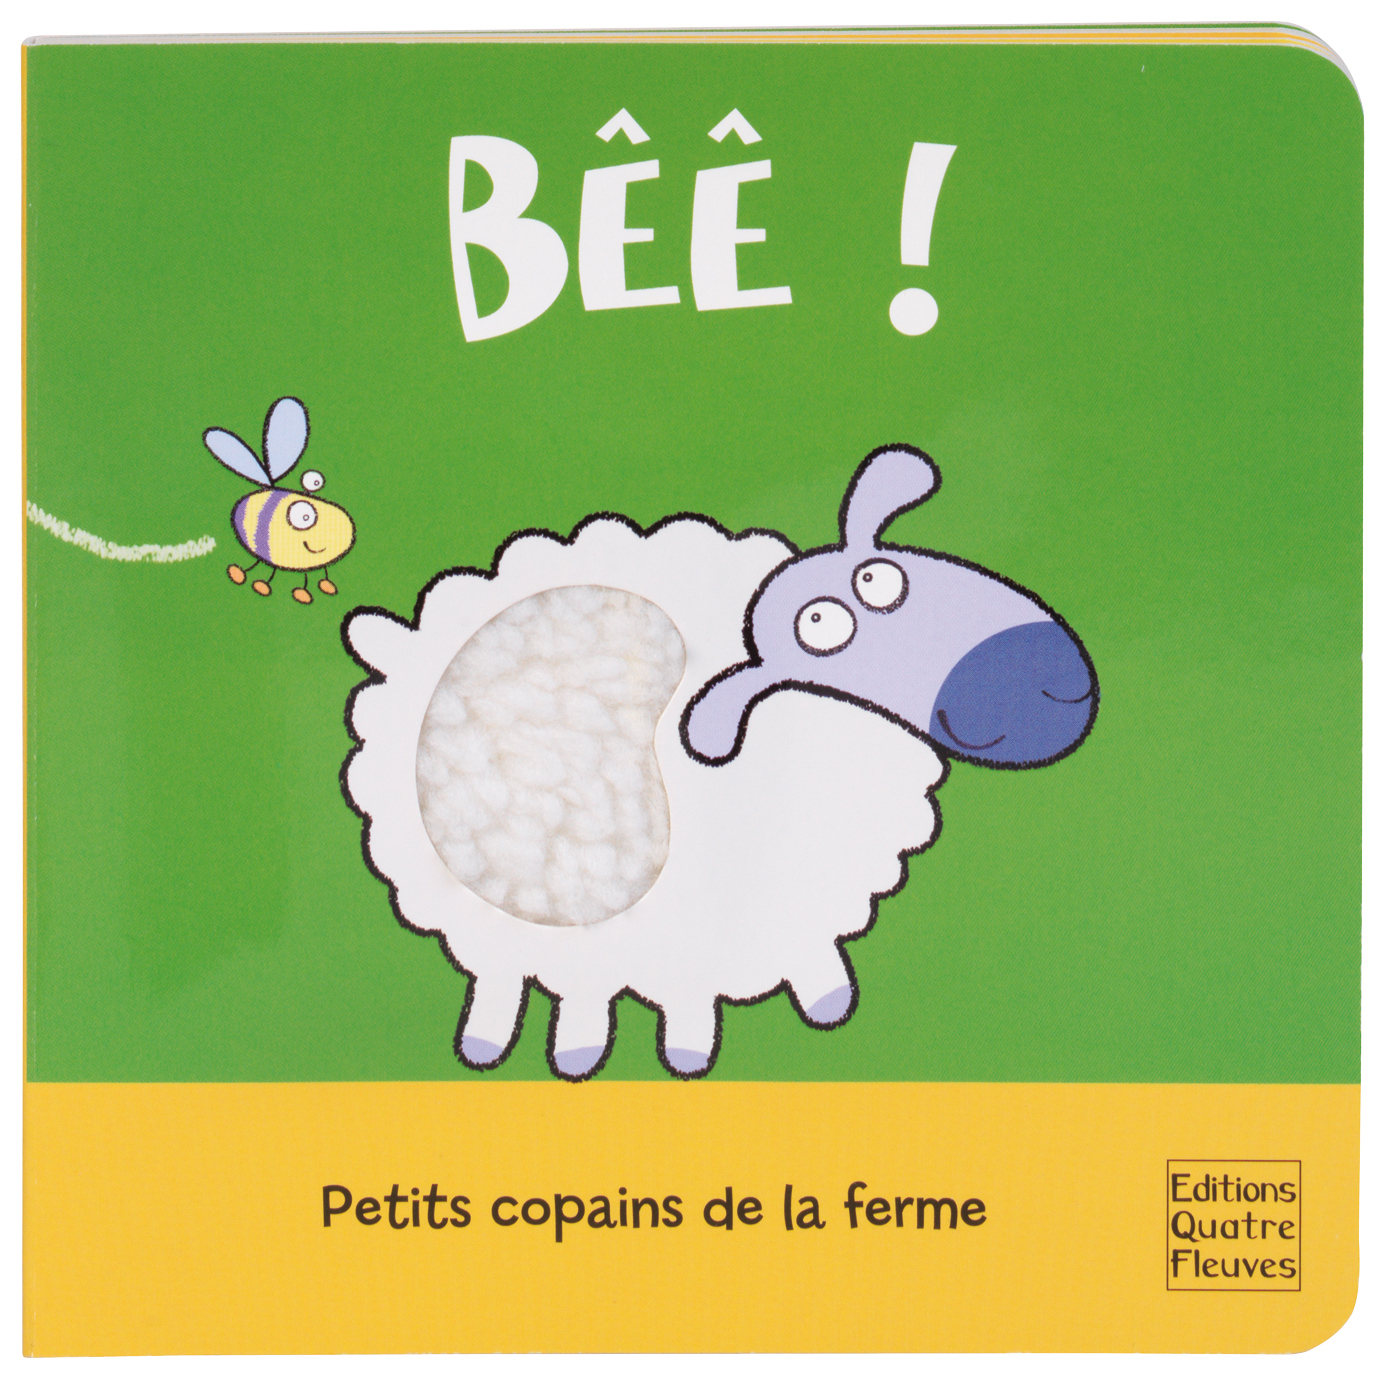 BEE !(MOUTON)